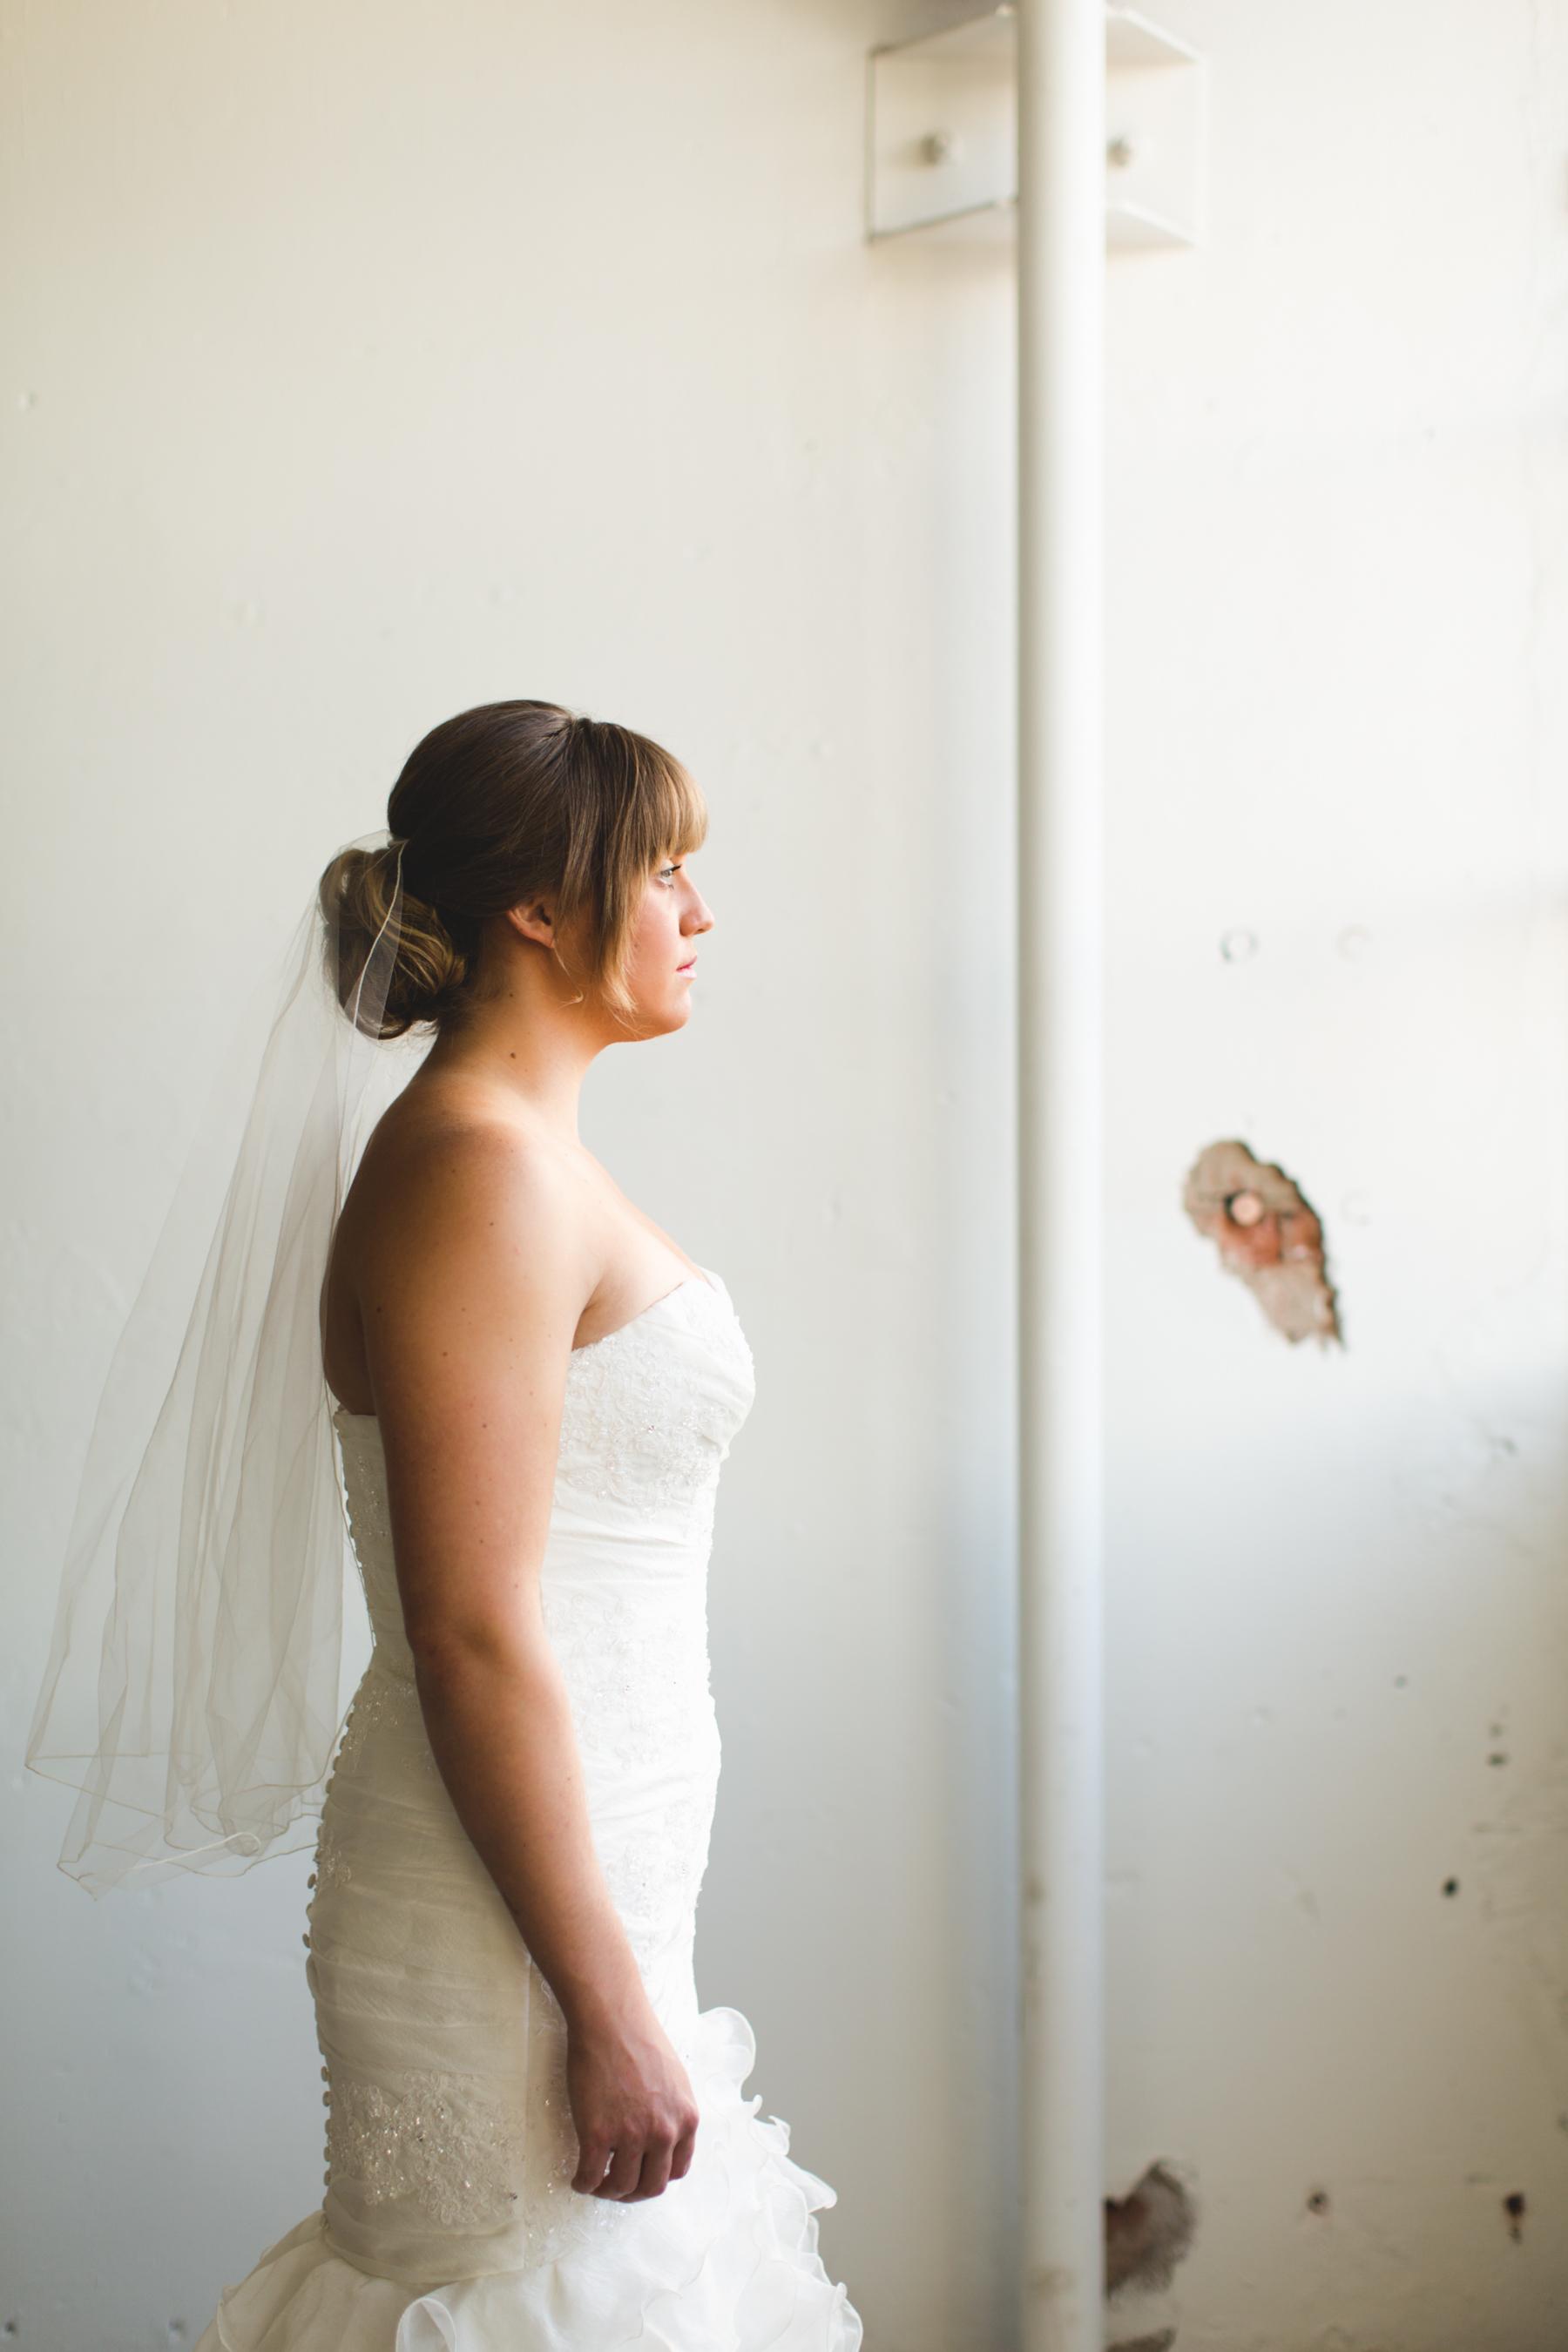 rachel-bridals-web-27.jpg